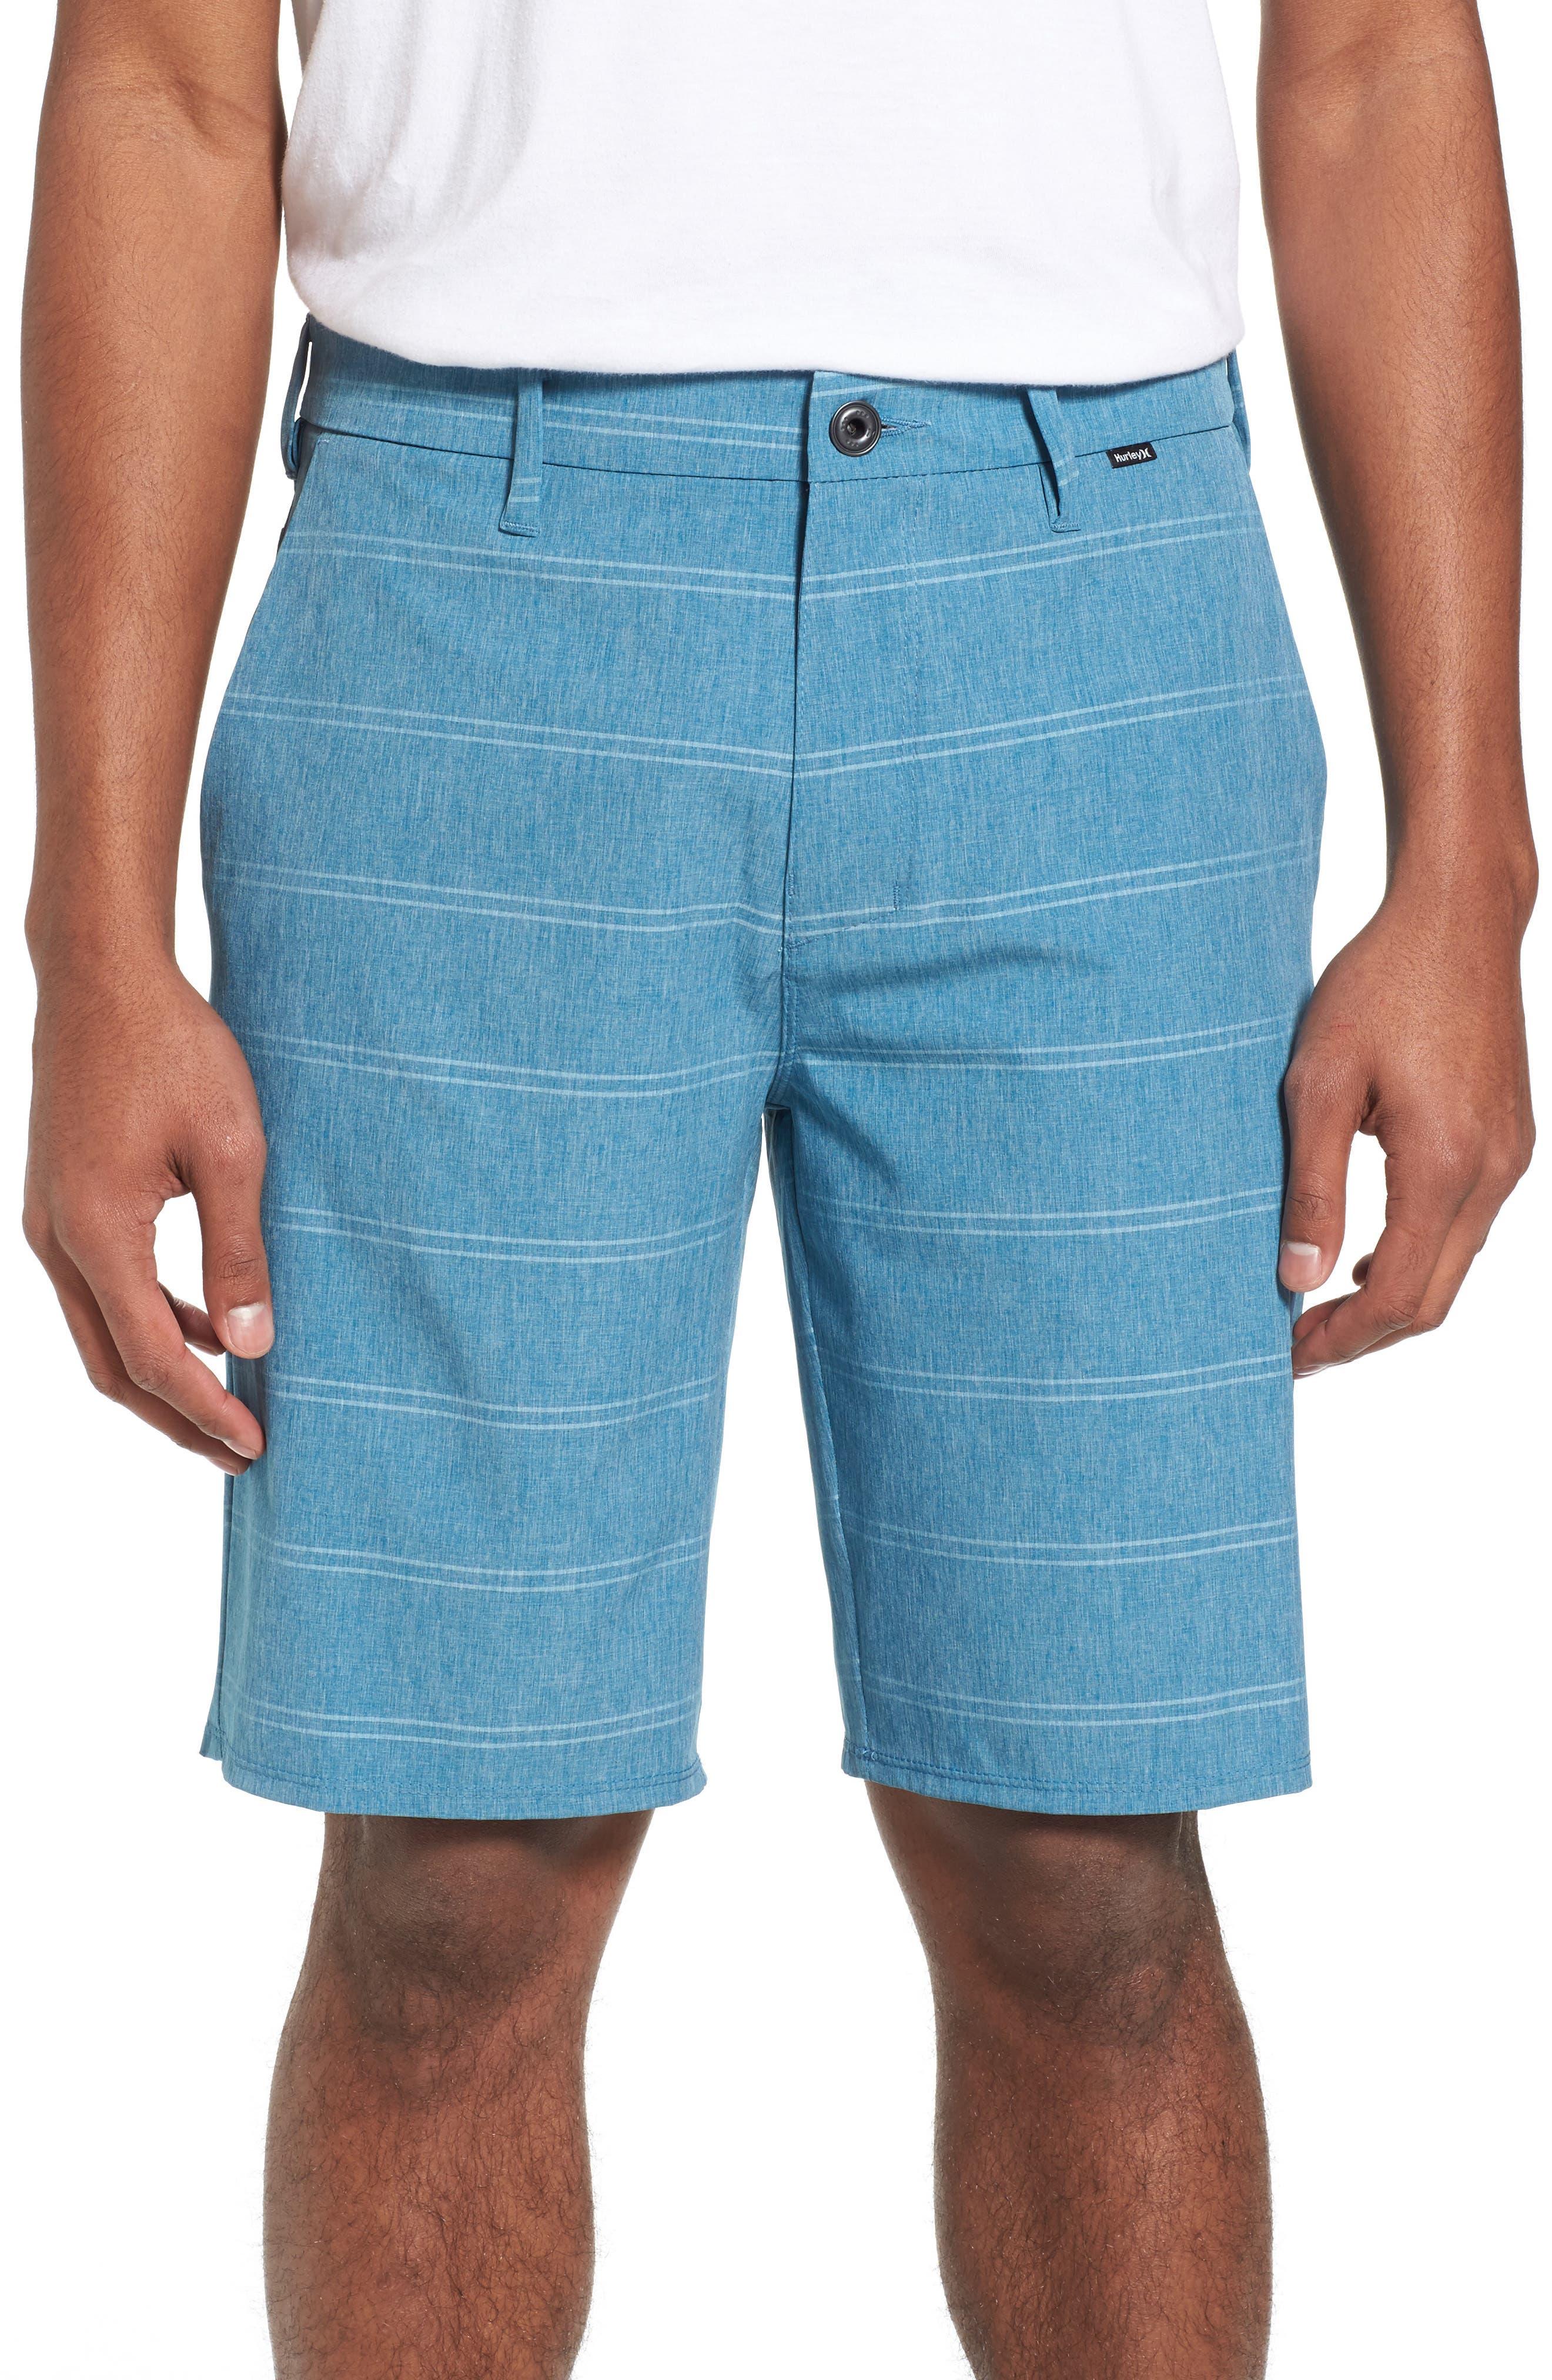 Phantom Hybrid Shorts,                         Main,                         color, Space Blue